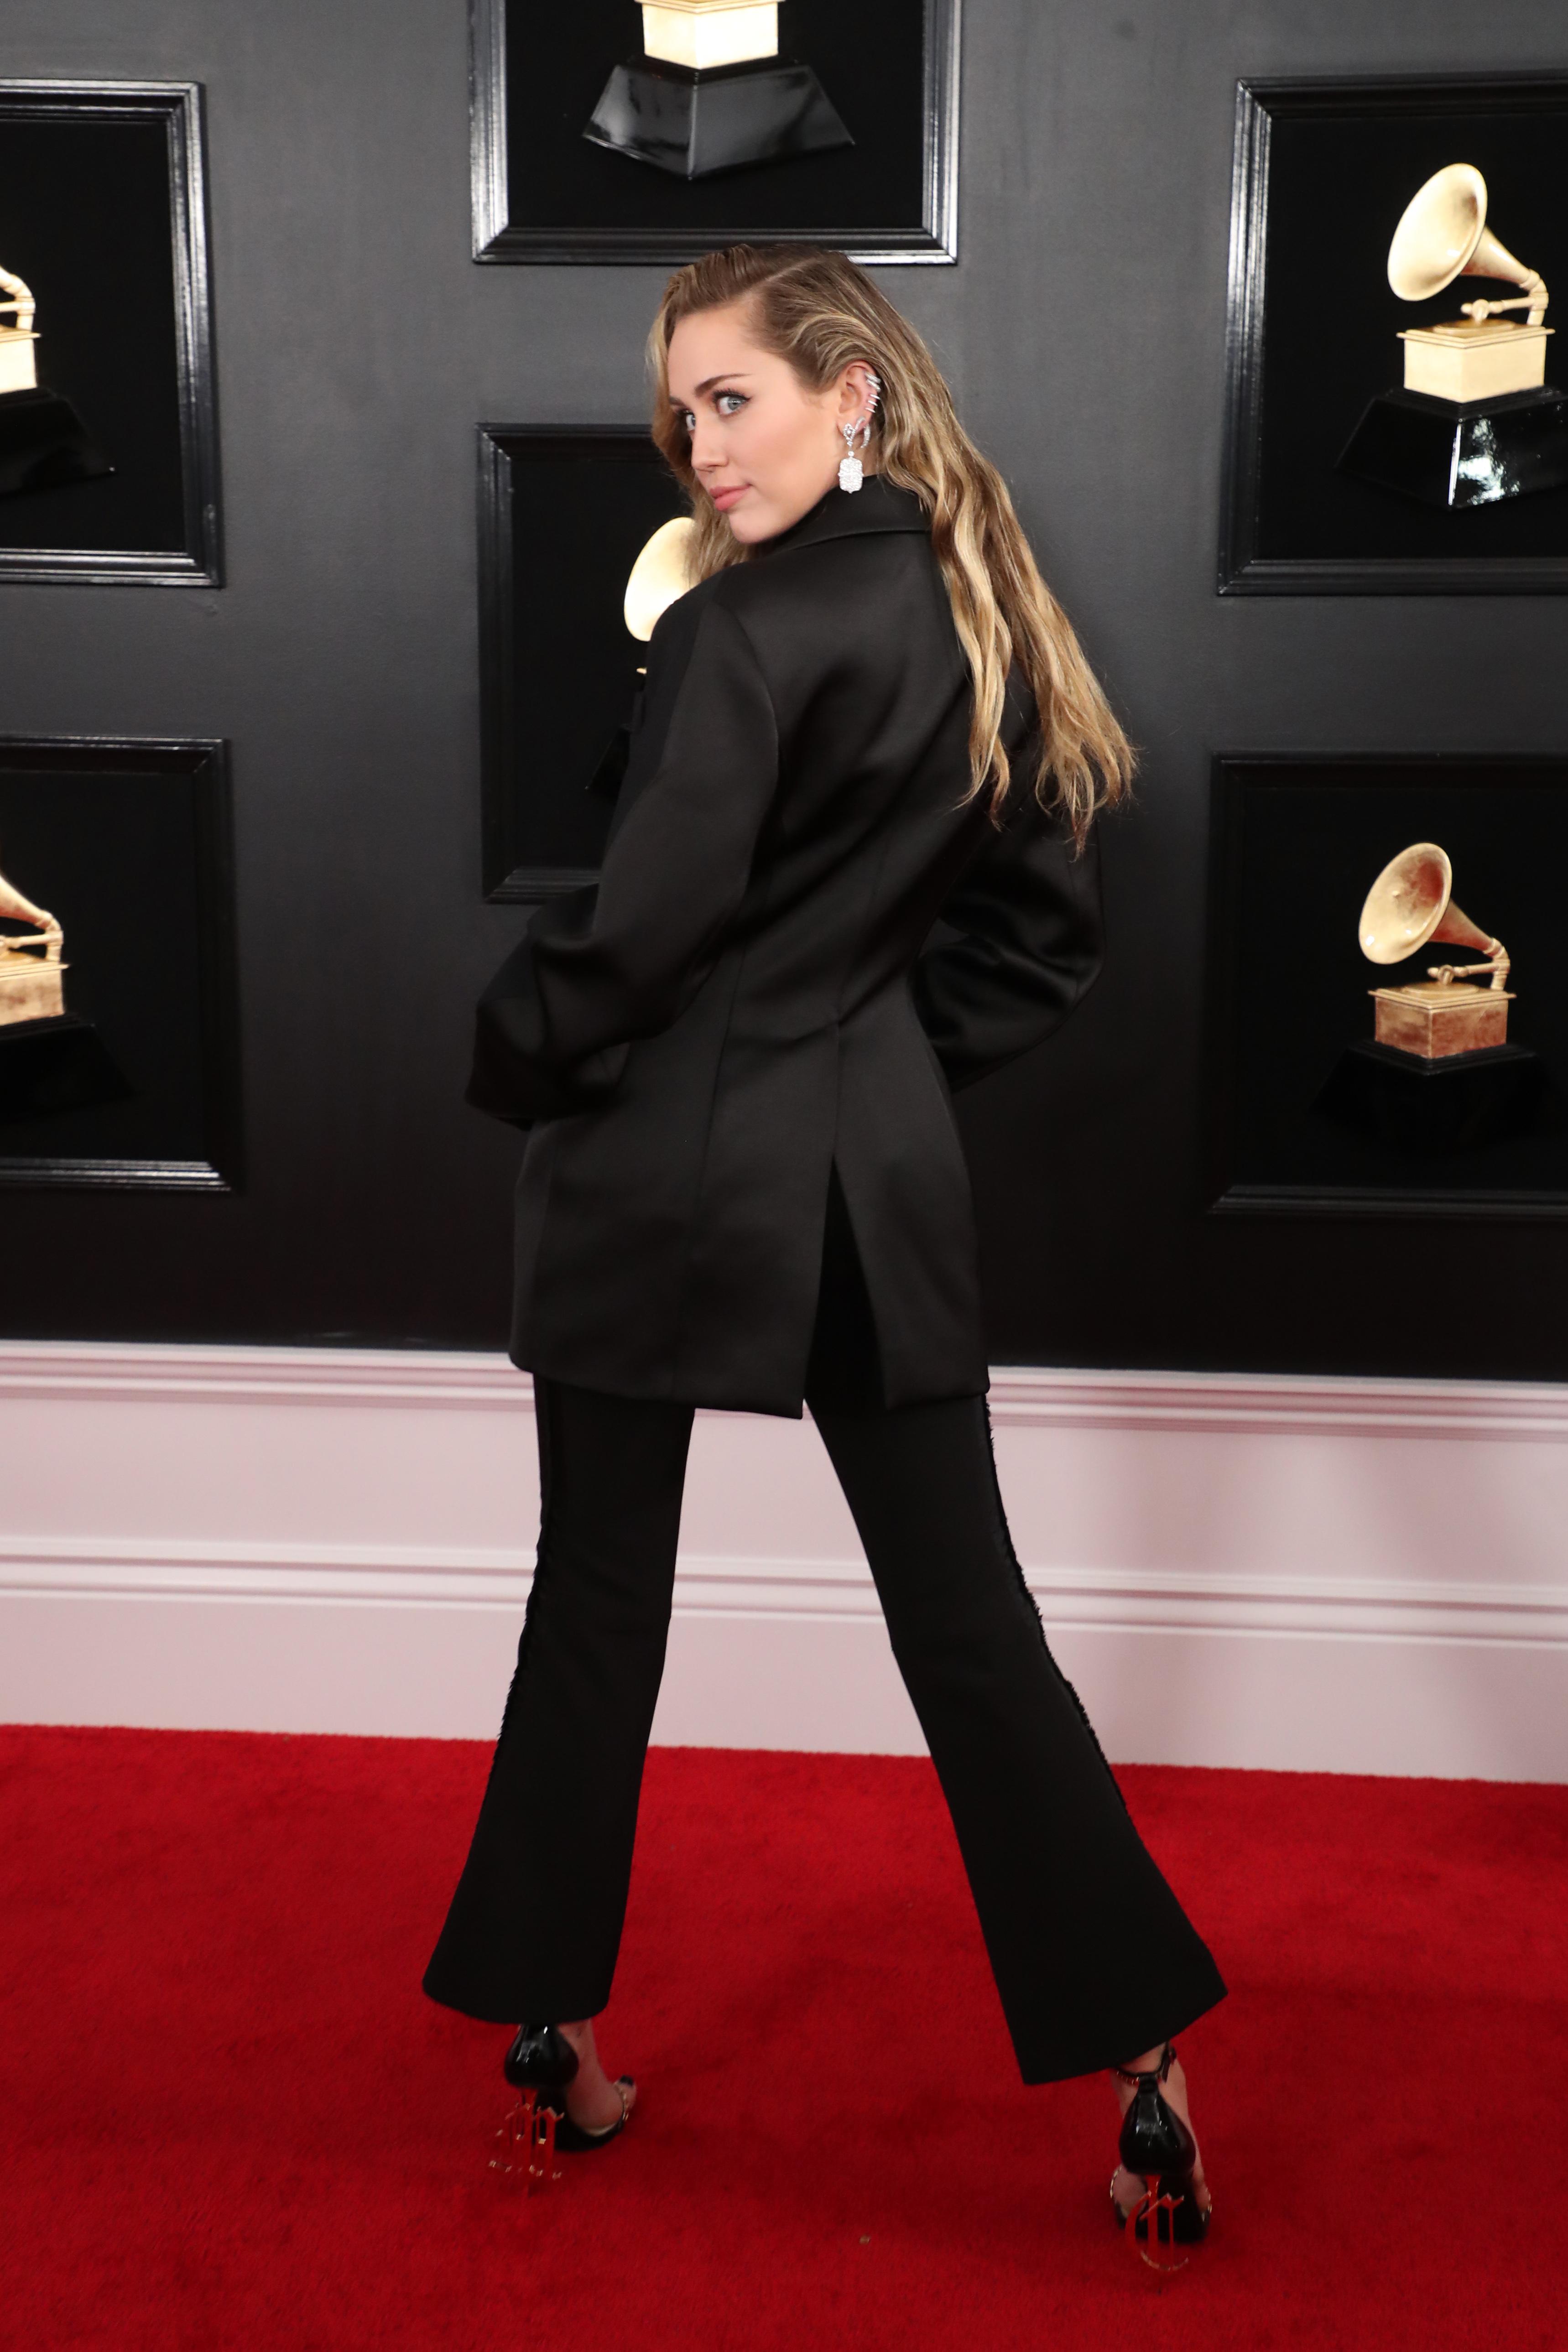 shutterstock 10095020ij Did Miley Cyrus Go Braless Under Her Grammys Power Suit?